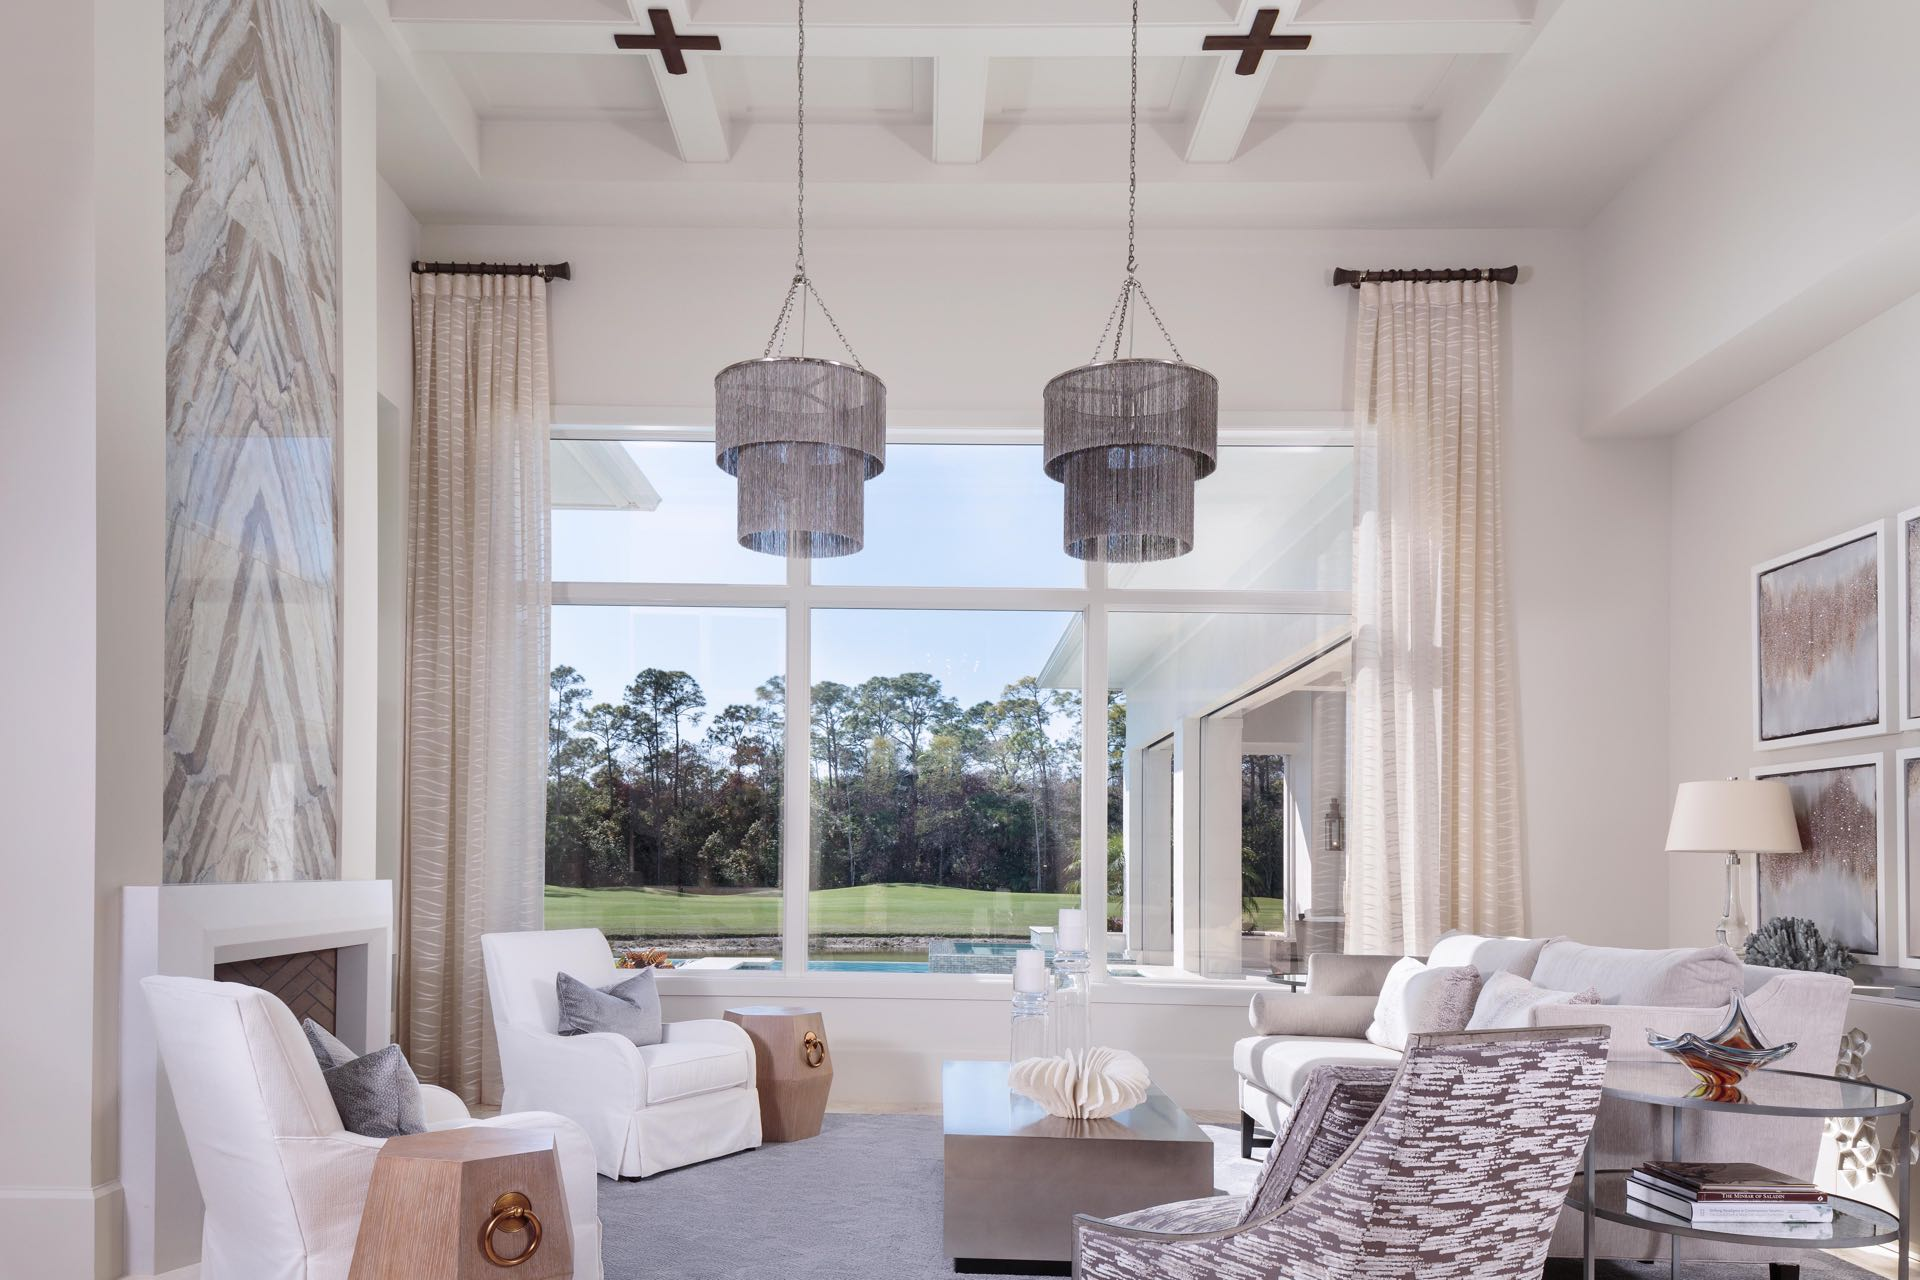 Socointeriors-luxury_Naples_Interiors-Transitional_Living_Room.jpg